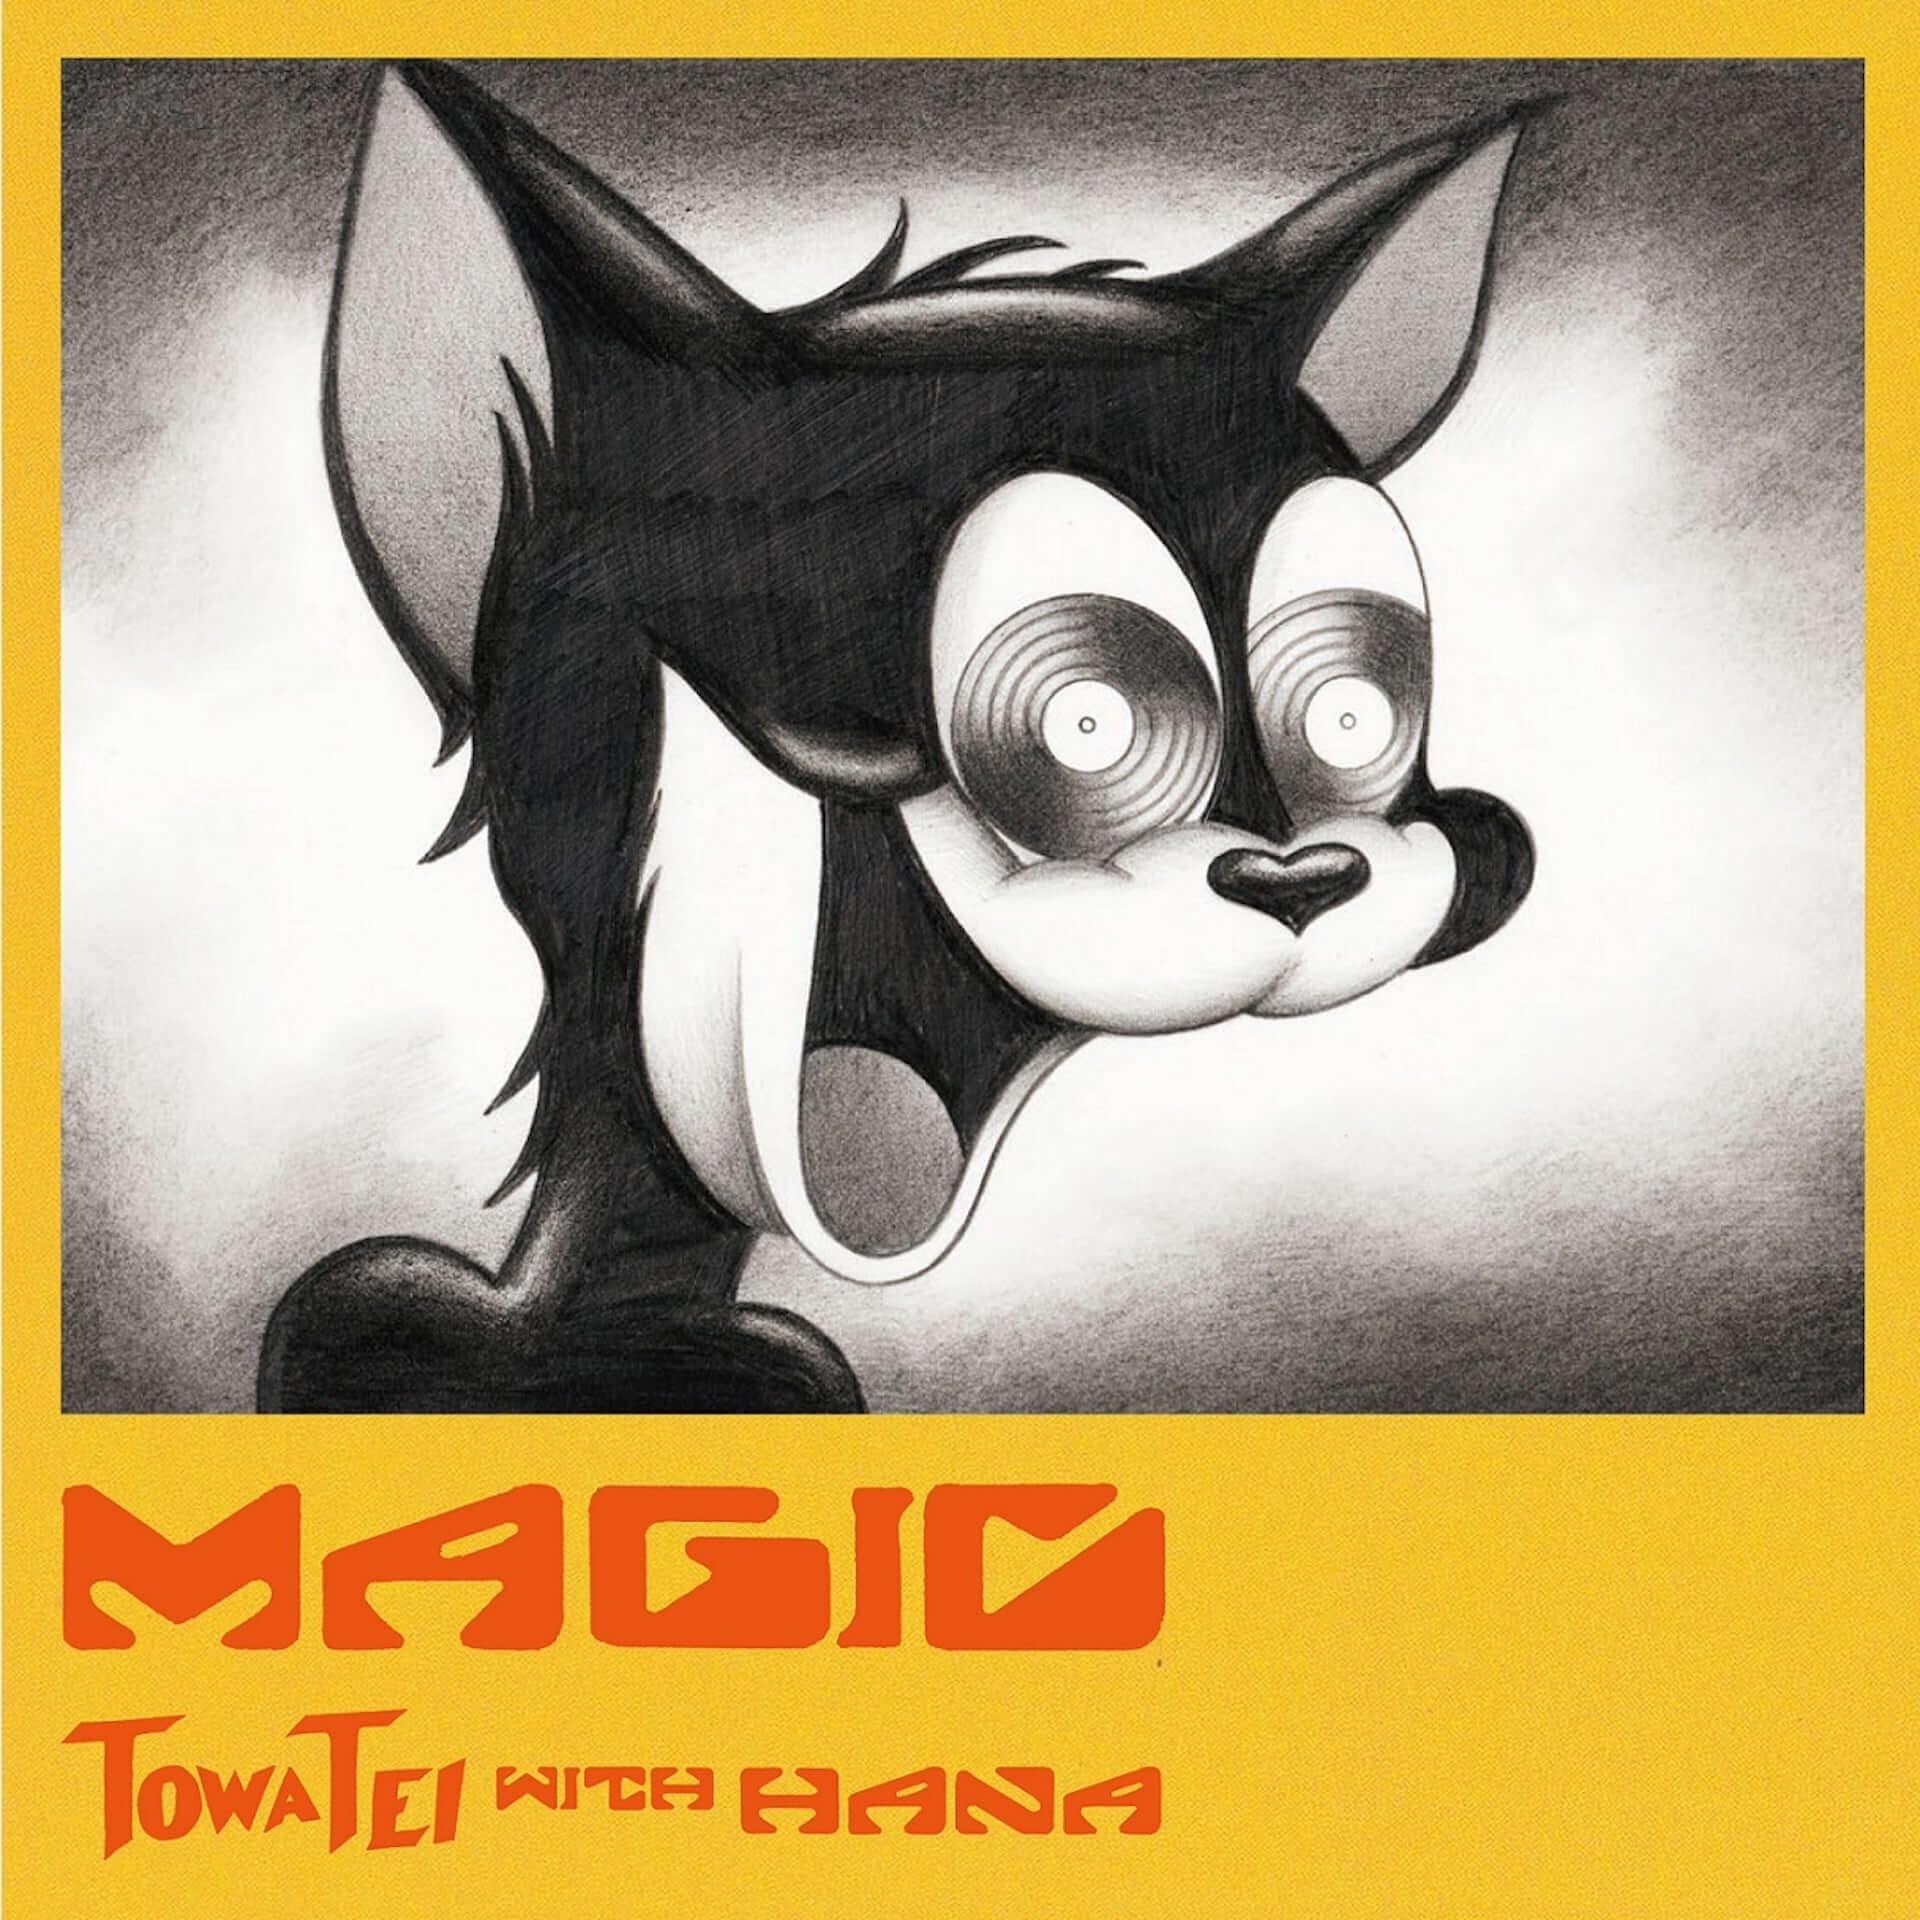 TOWA TEIのデビュー30周年を飾る7インチ・アナログ盤『MAGIC』が限定リリース決定!2nd&3rdアルバムのサブスクも解禁 music200423_towatei_2-1920x1920